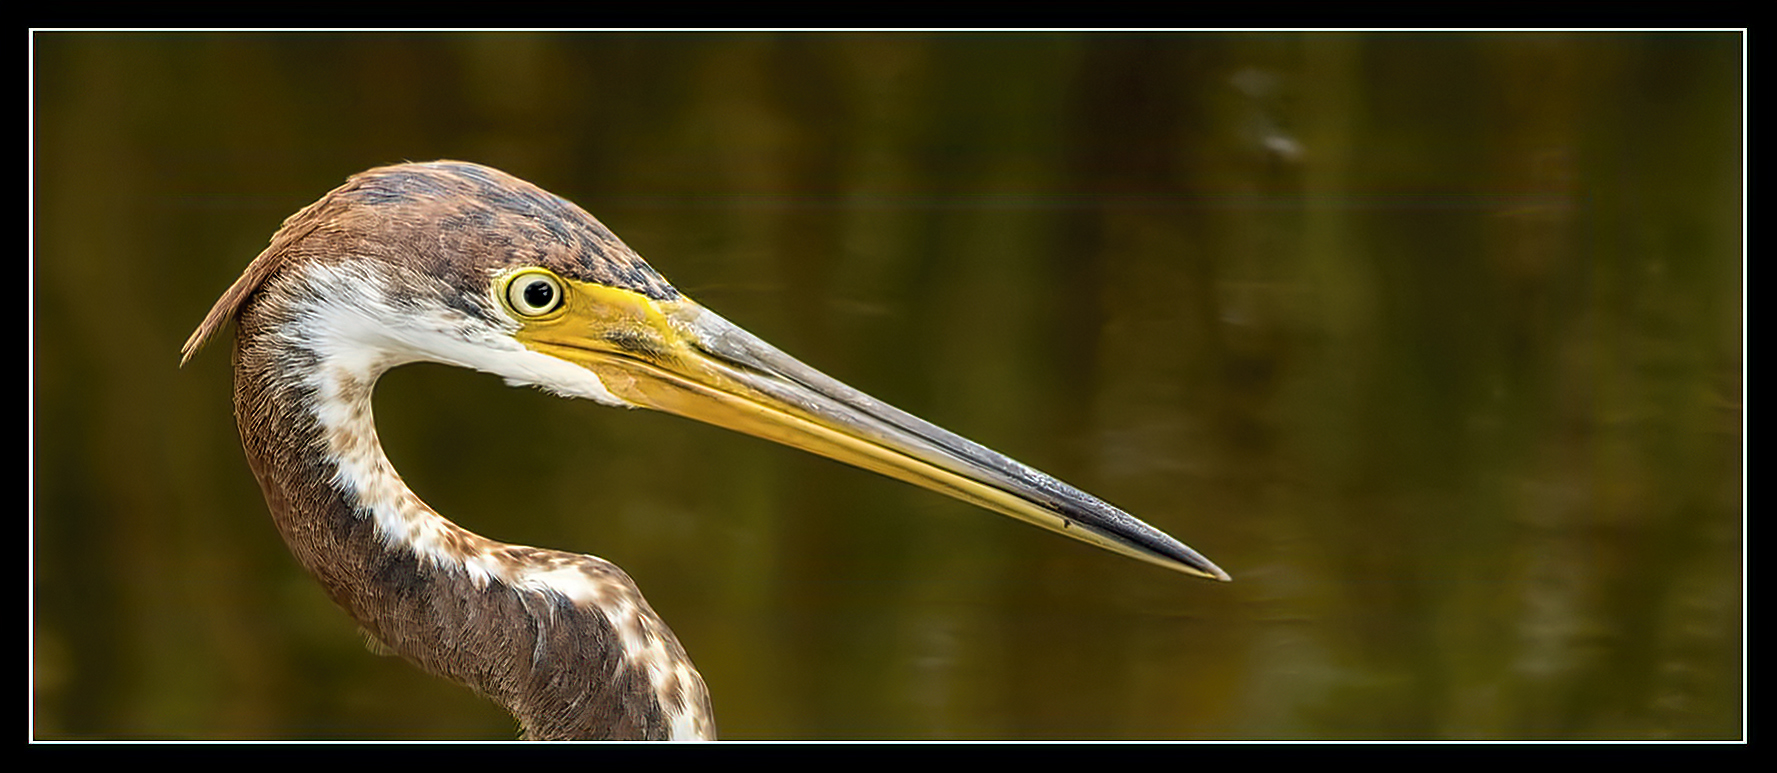 Juvenile Tricolored Heron Headshot.jpg